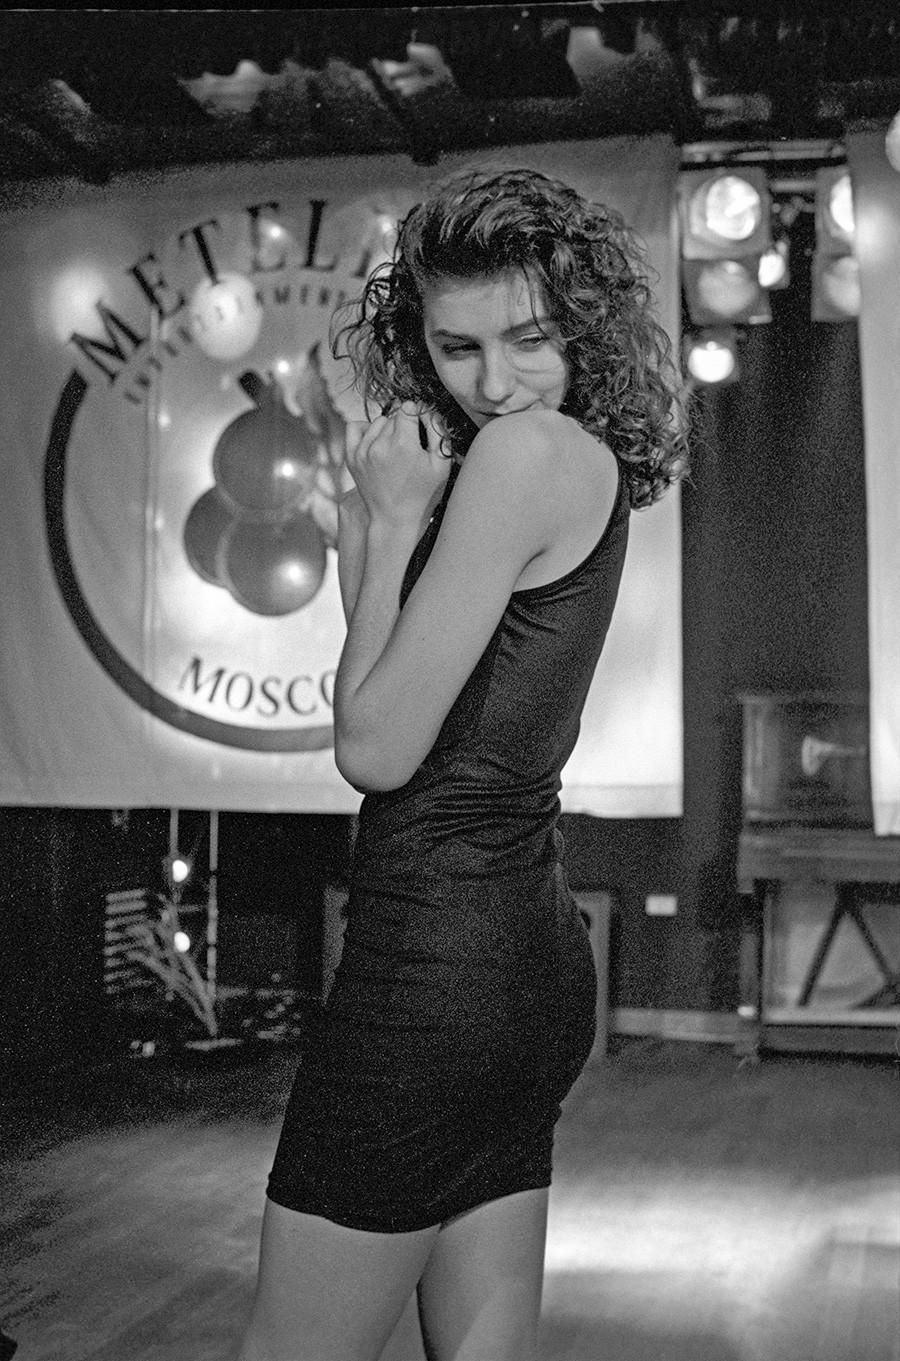 Natalia Petrovskaya at a beauty pageant in Metelitsa, 1994.